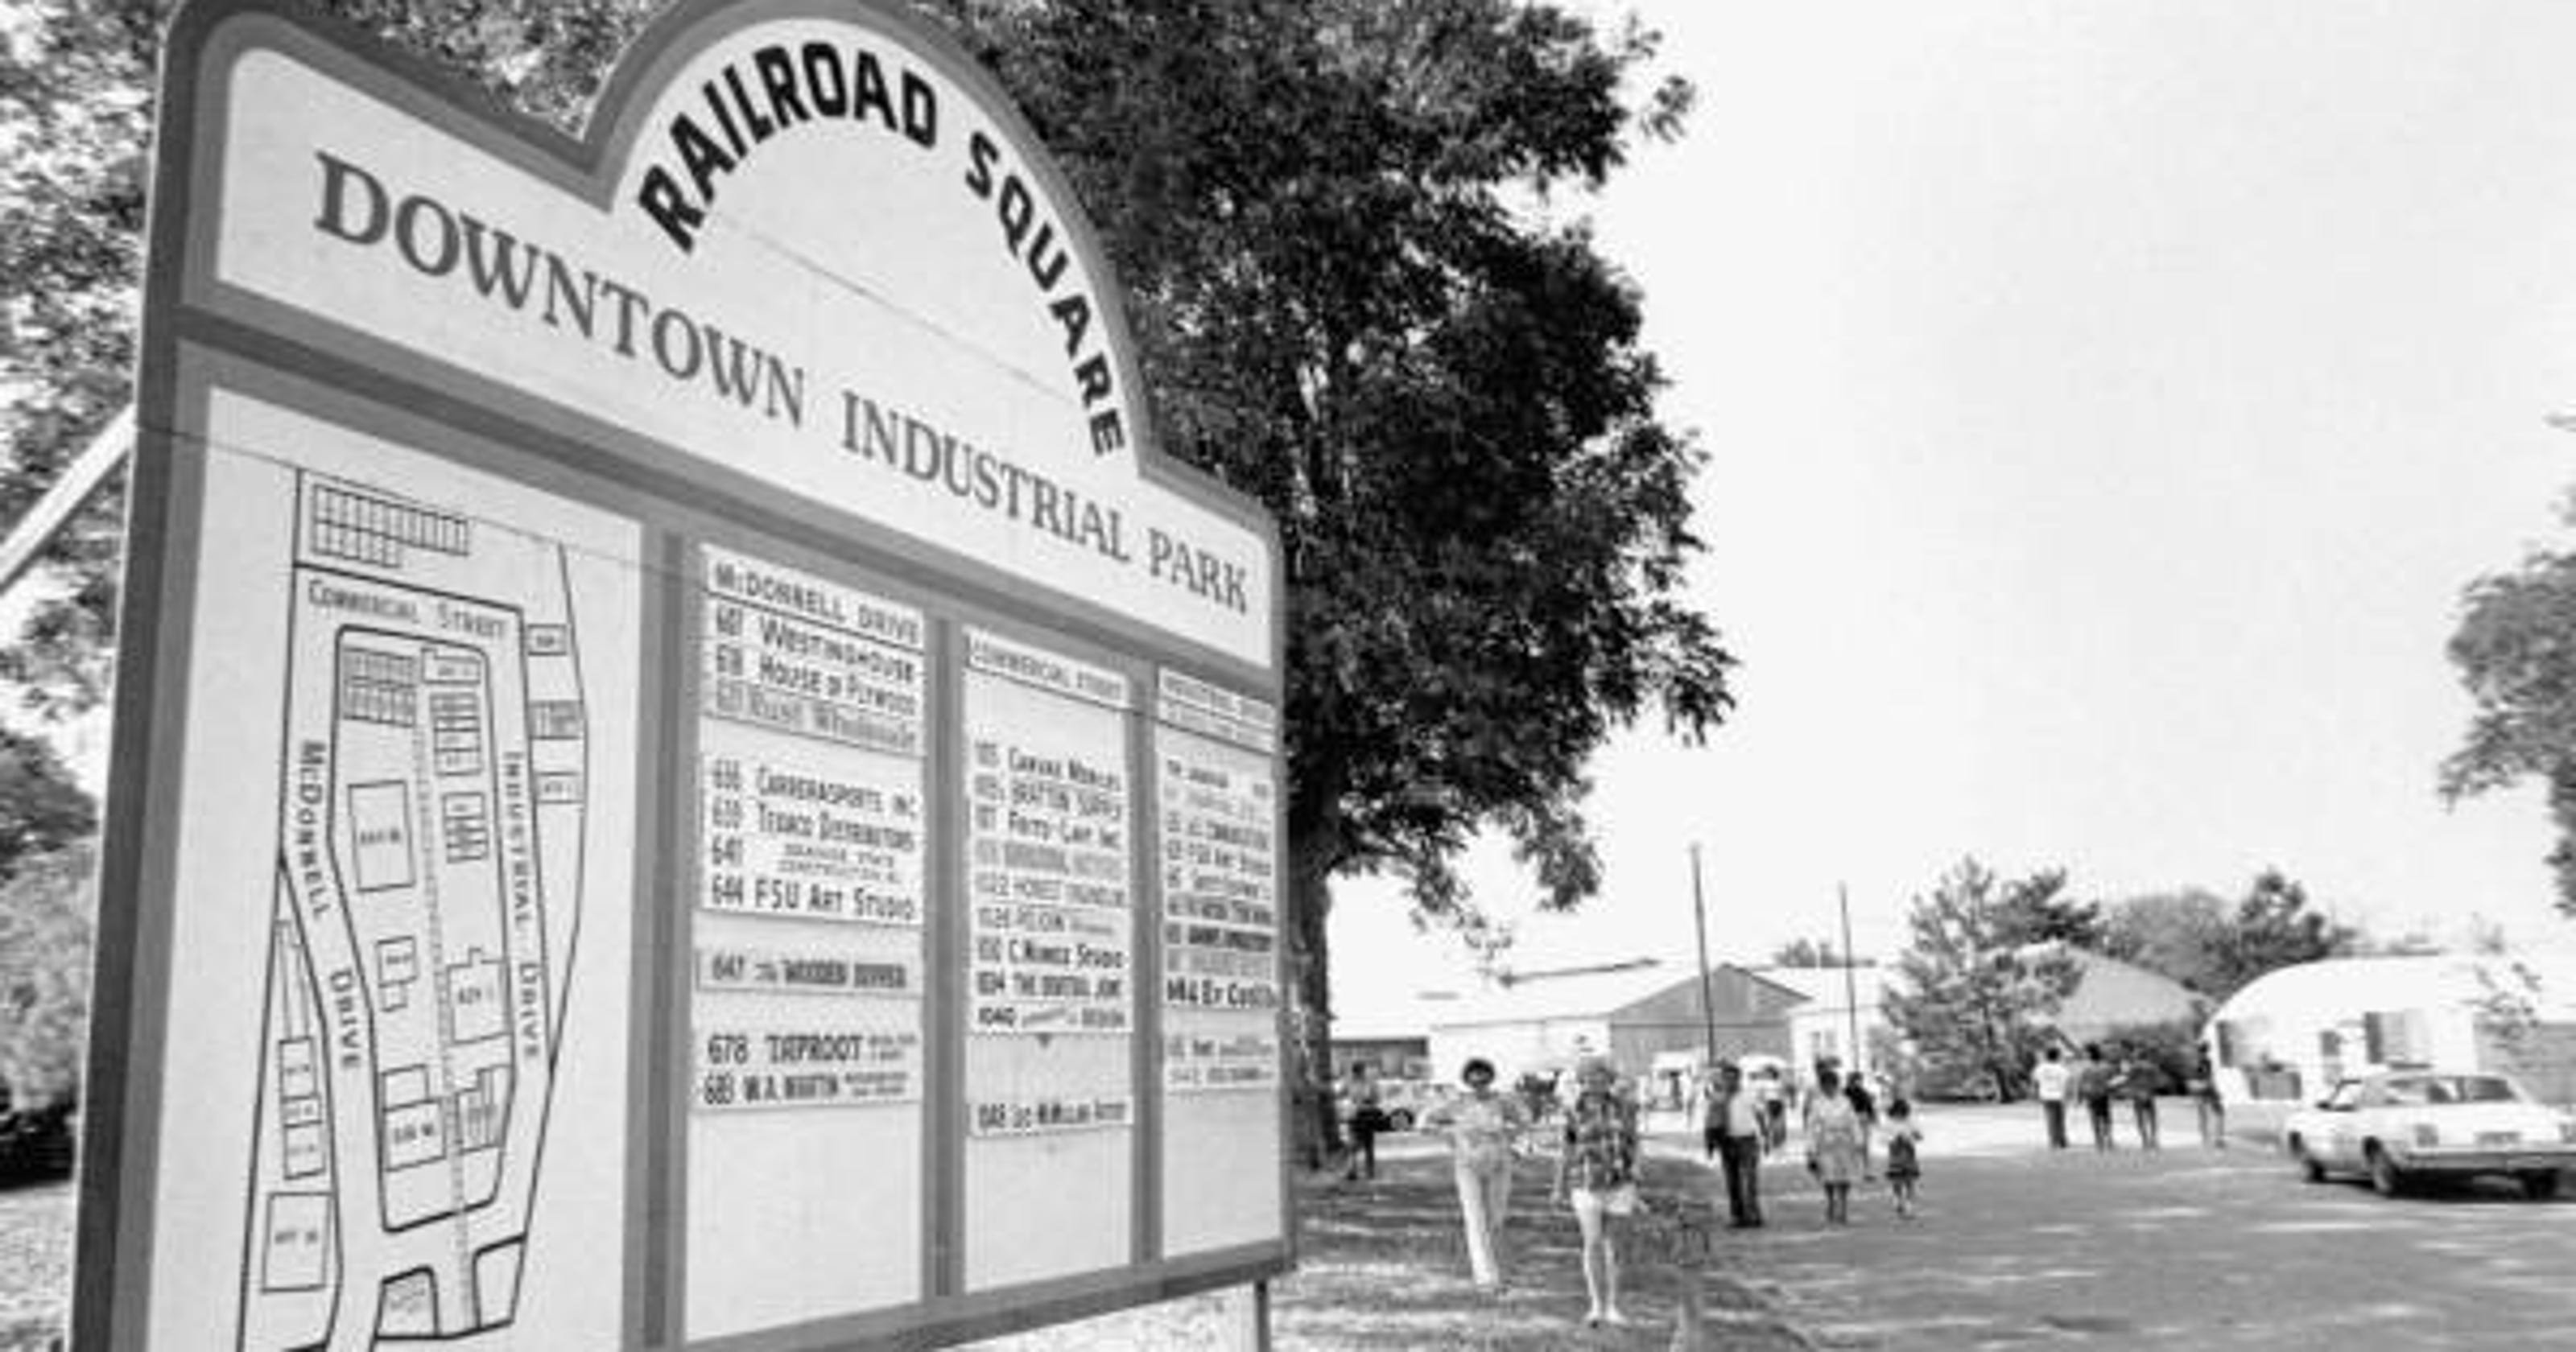 Railroad Square Art Park began as sawmill, lumber yard